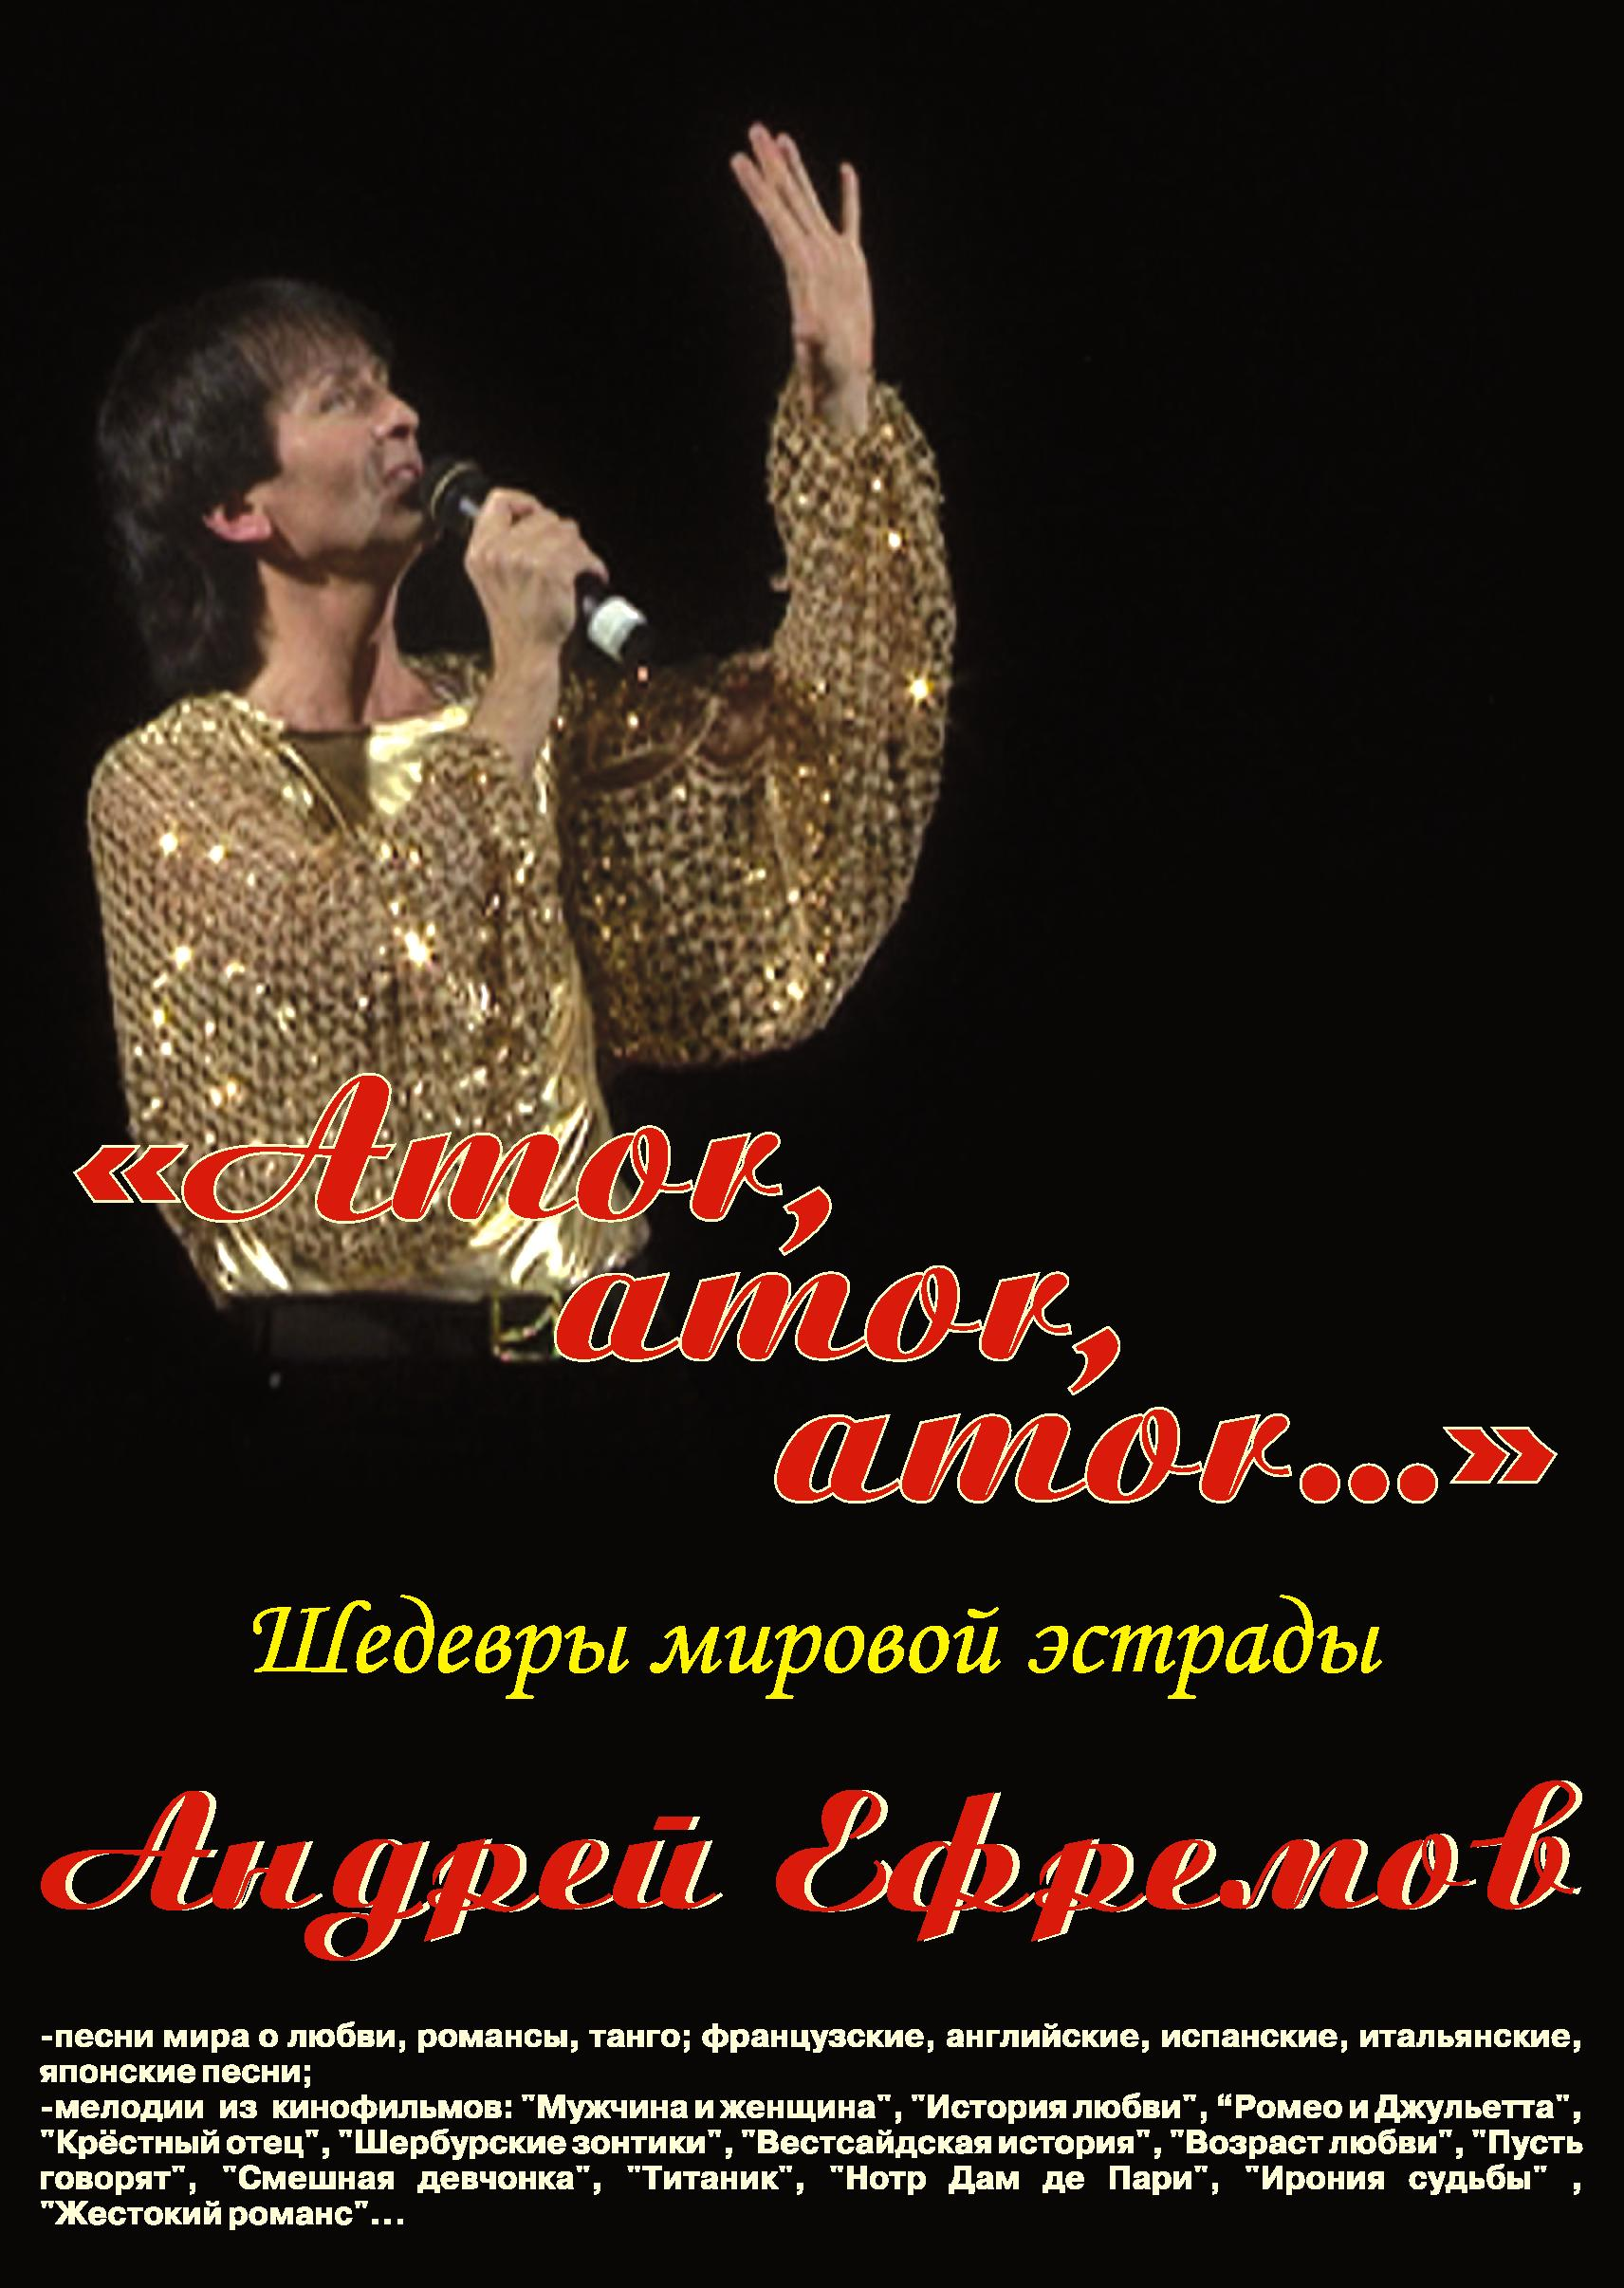 http://andreyefremov.ru/POSTERS/post1.jpg